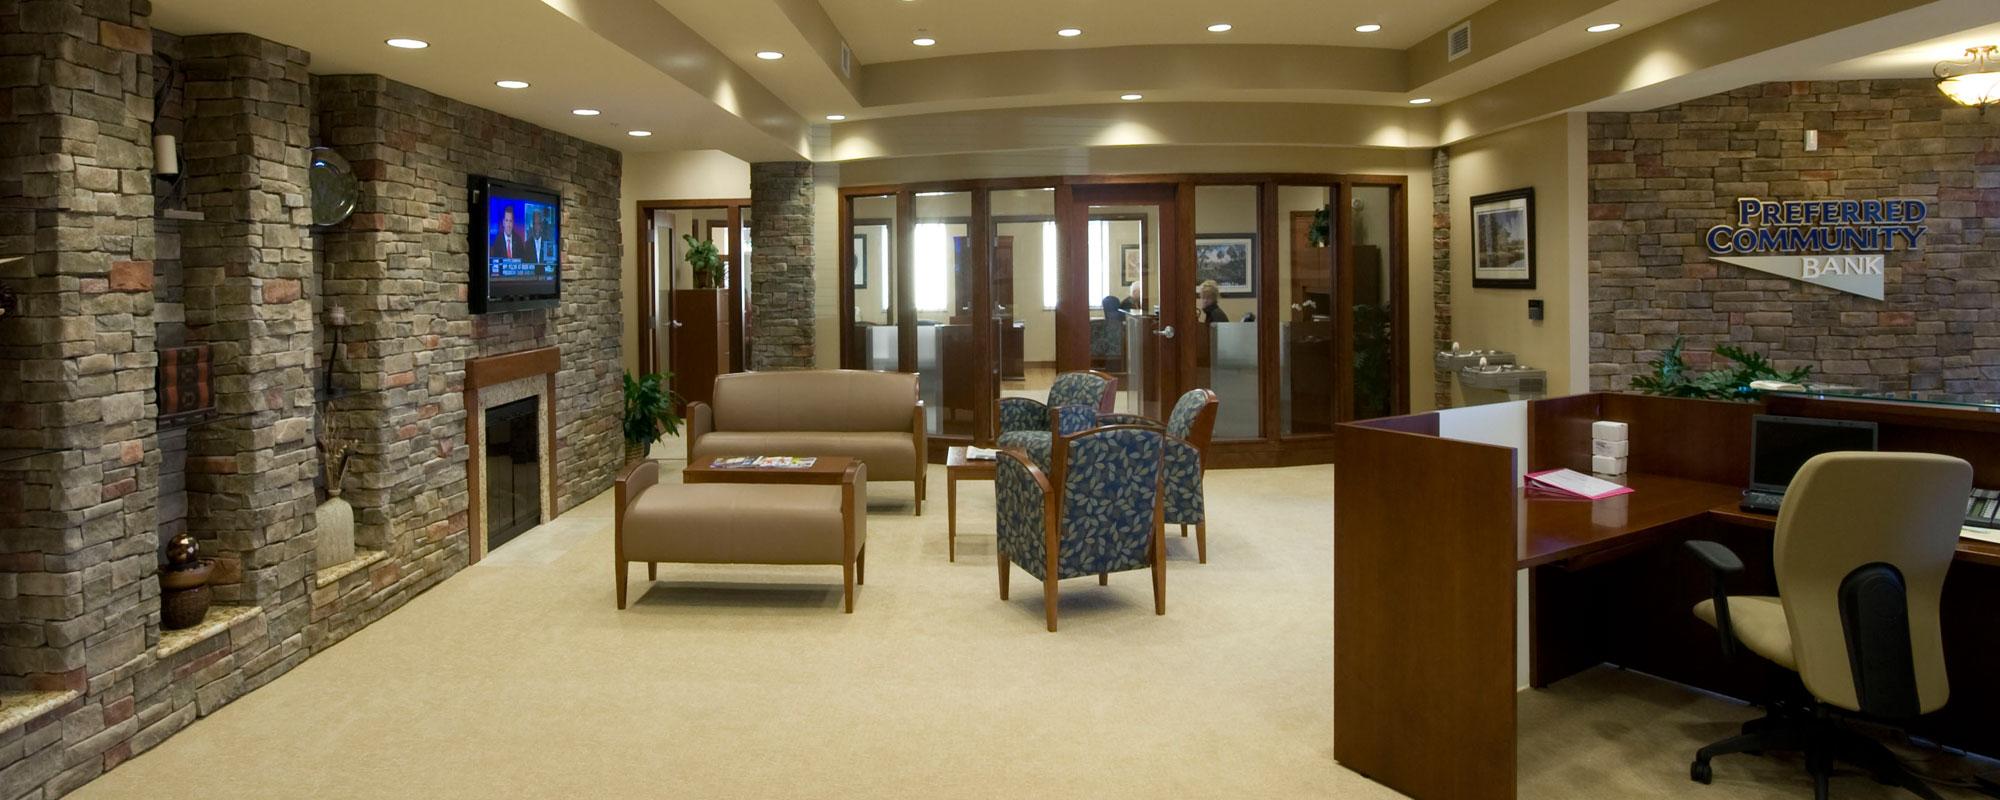 Preferred Community Bank – Ft. Myers